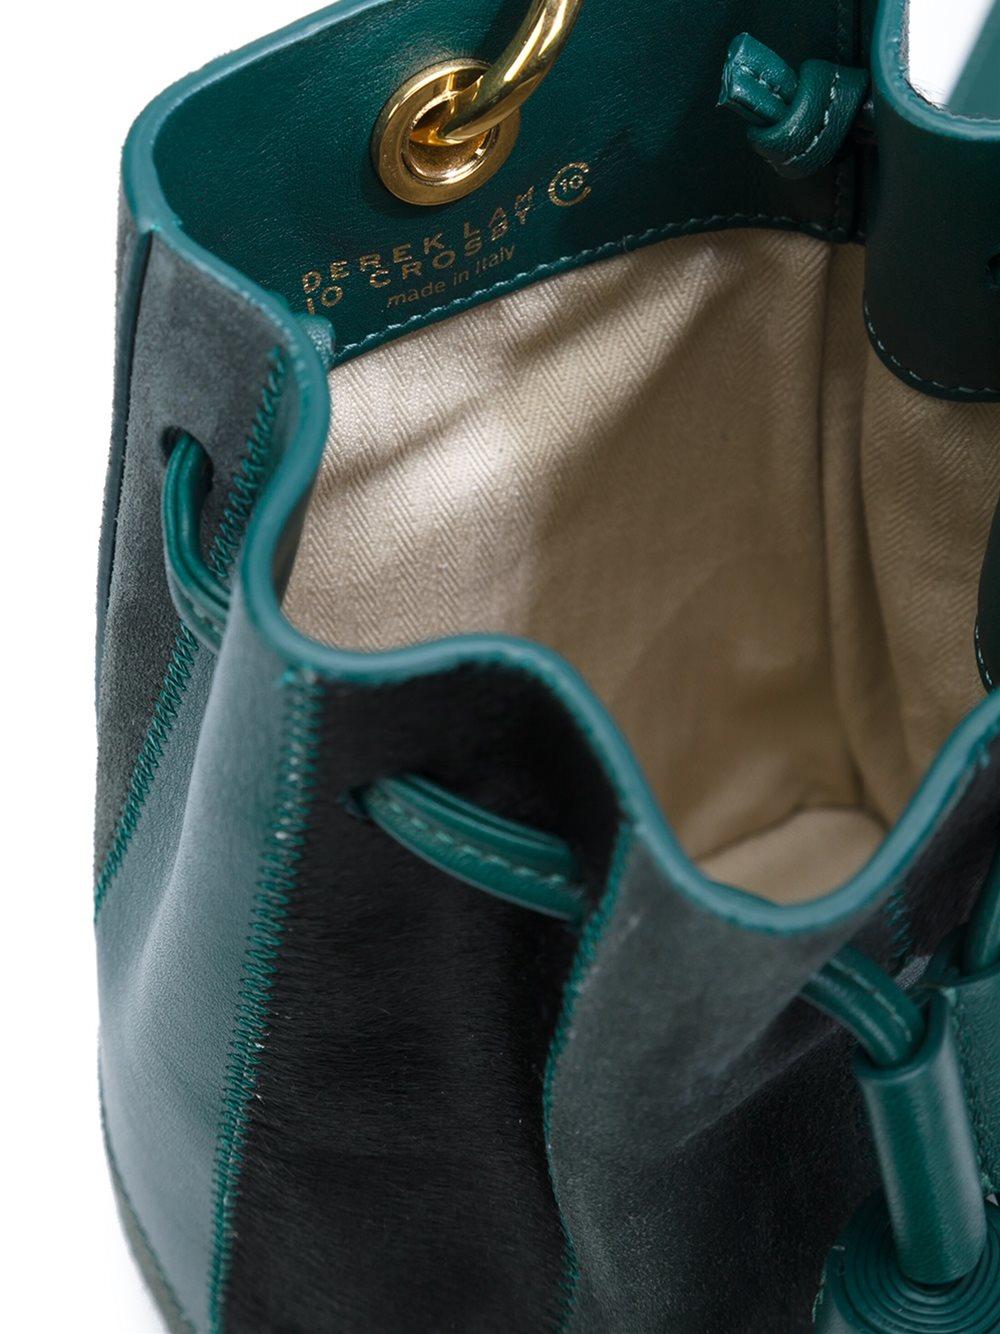 10 Crosby Derek Lam Leather Mini 'prince Bucket' Crossbody Bag in Green